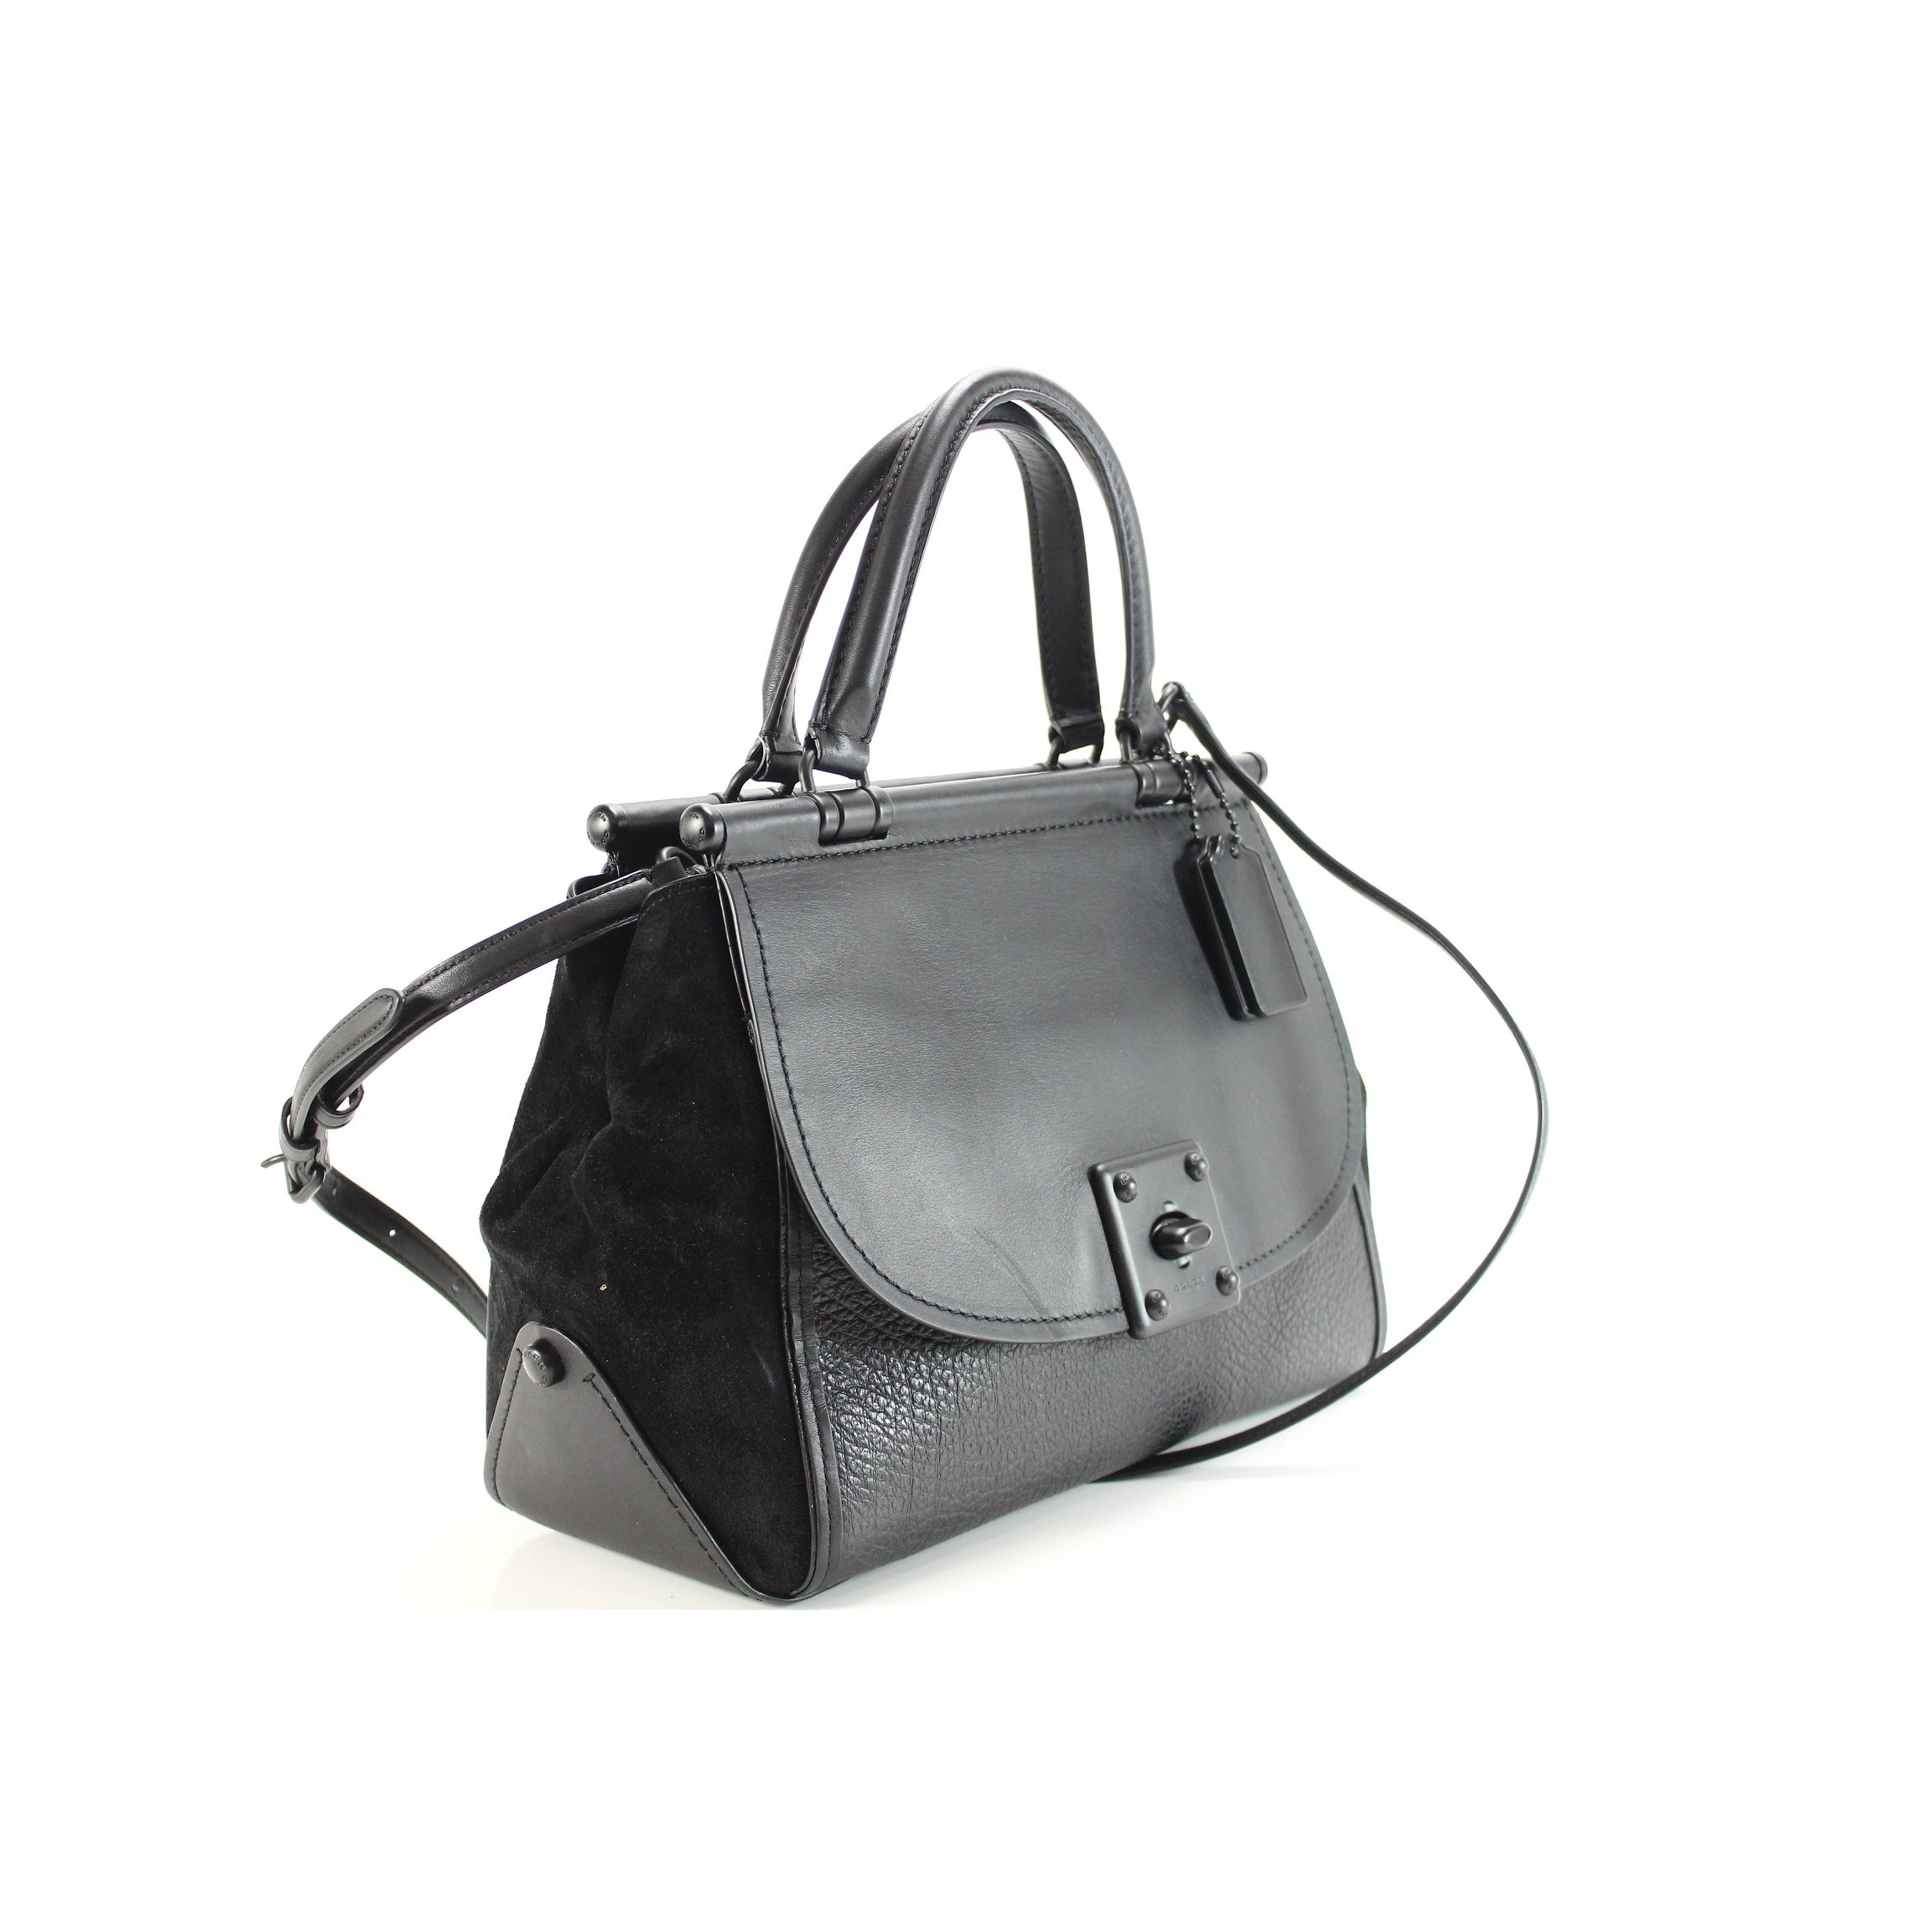 935562164 ... sale shop coach new matte black drifter carryall satchel leather  handbag purse free shipping today overstock